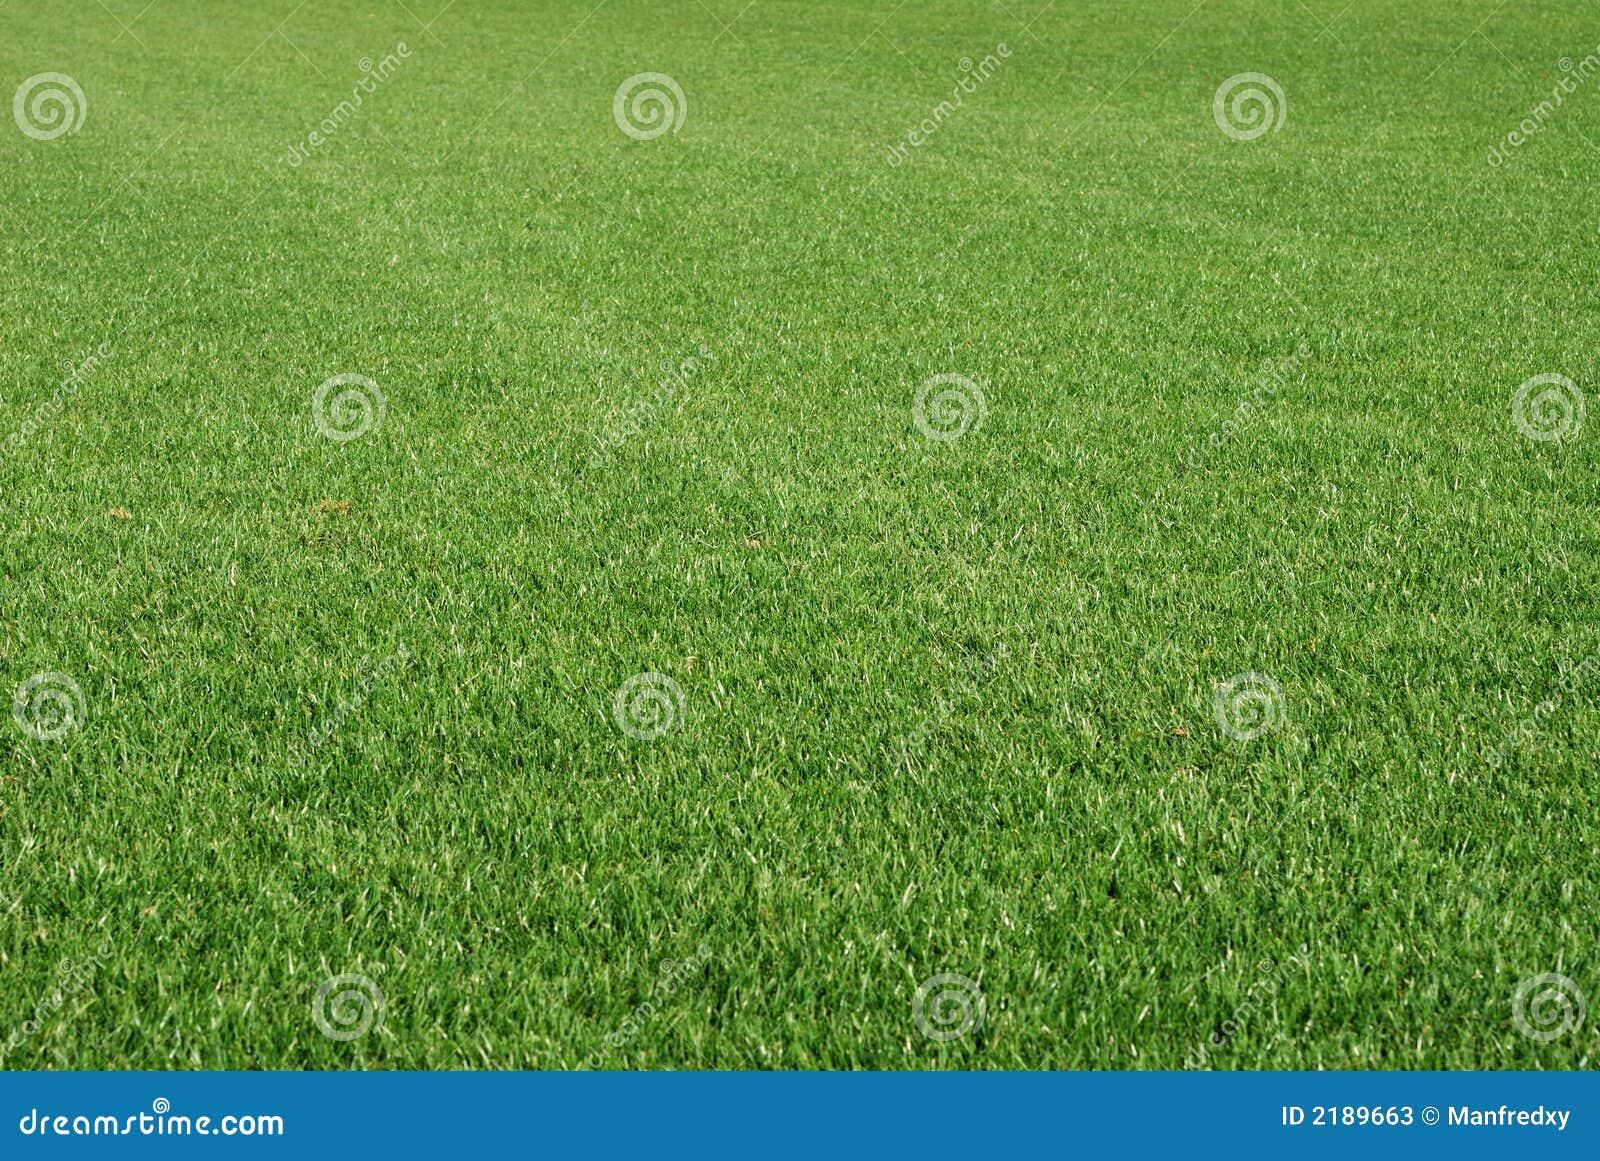 Perfekt lawn